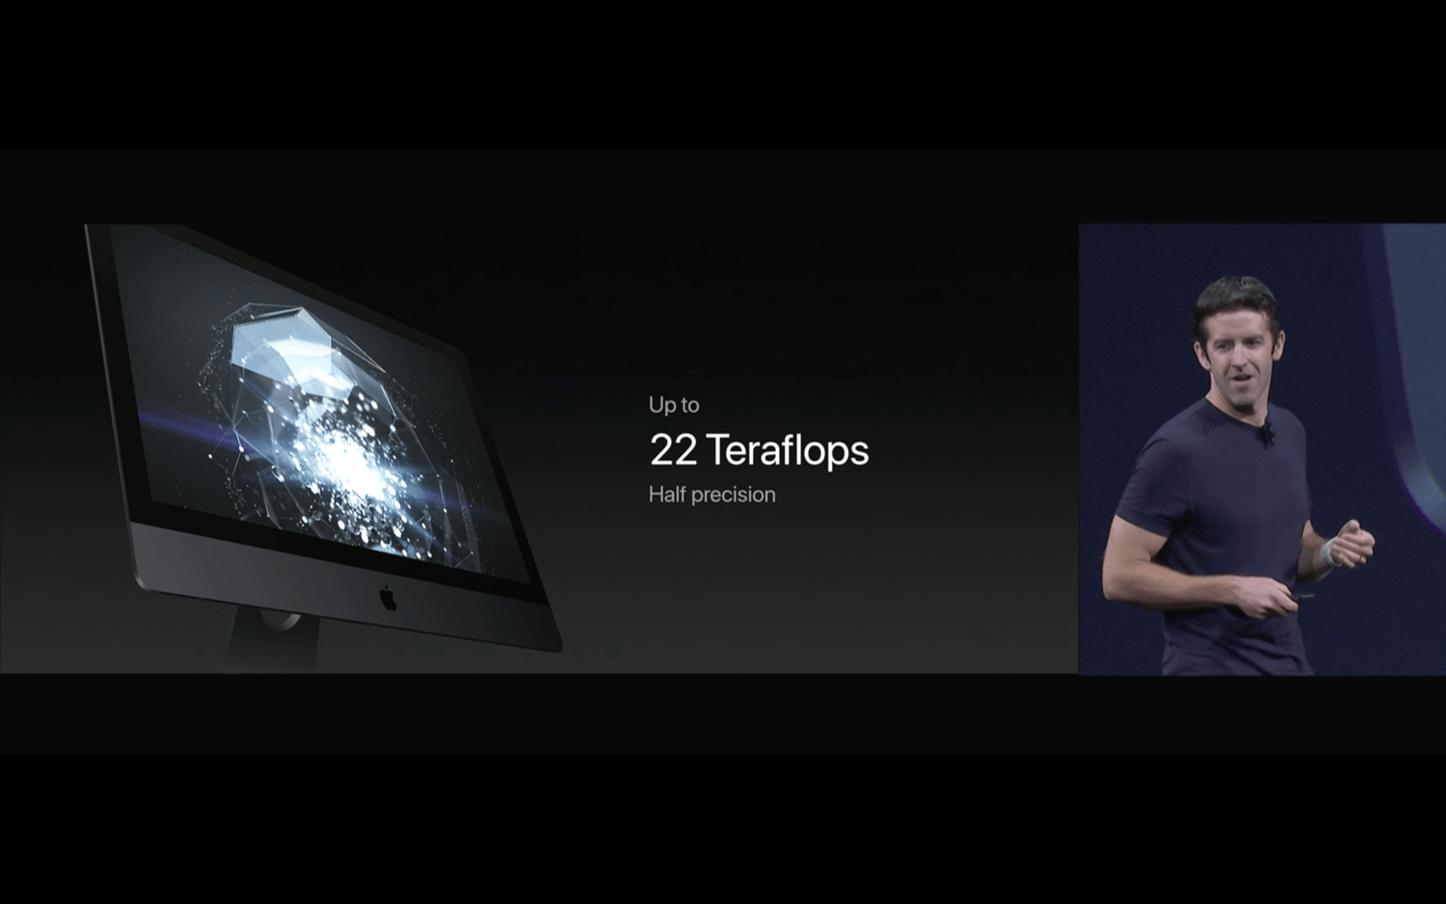 iMac-Pro-2017-WWDC17-16.png